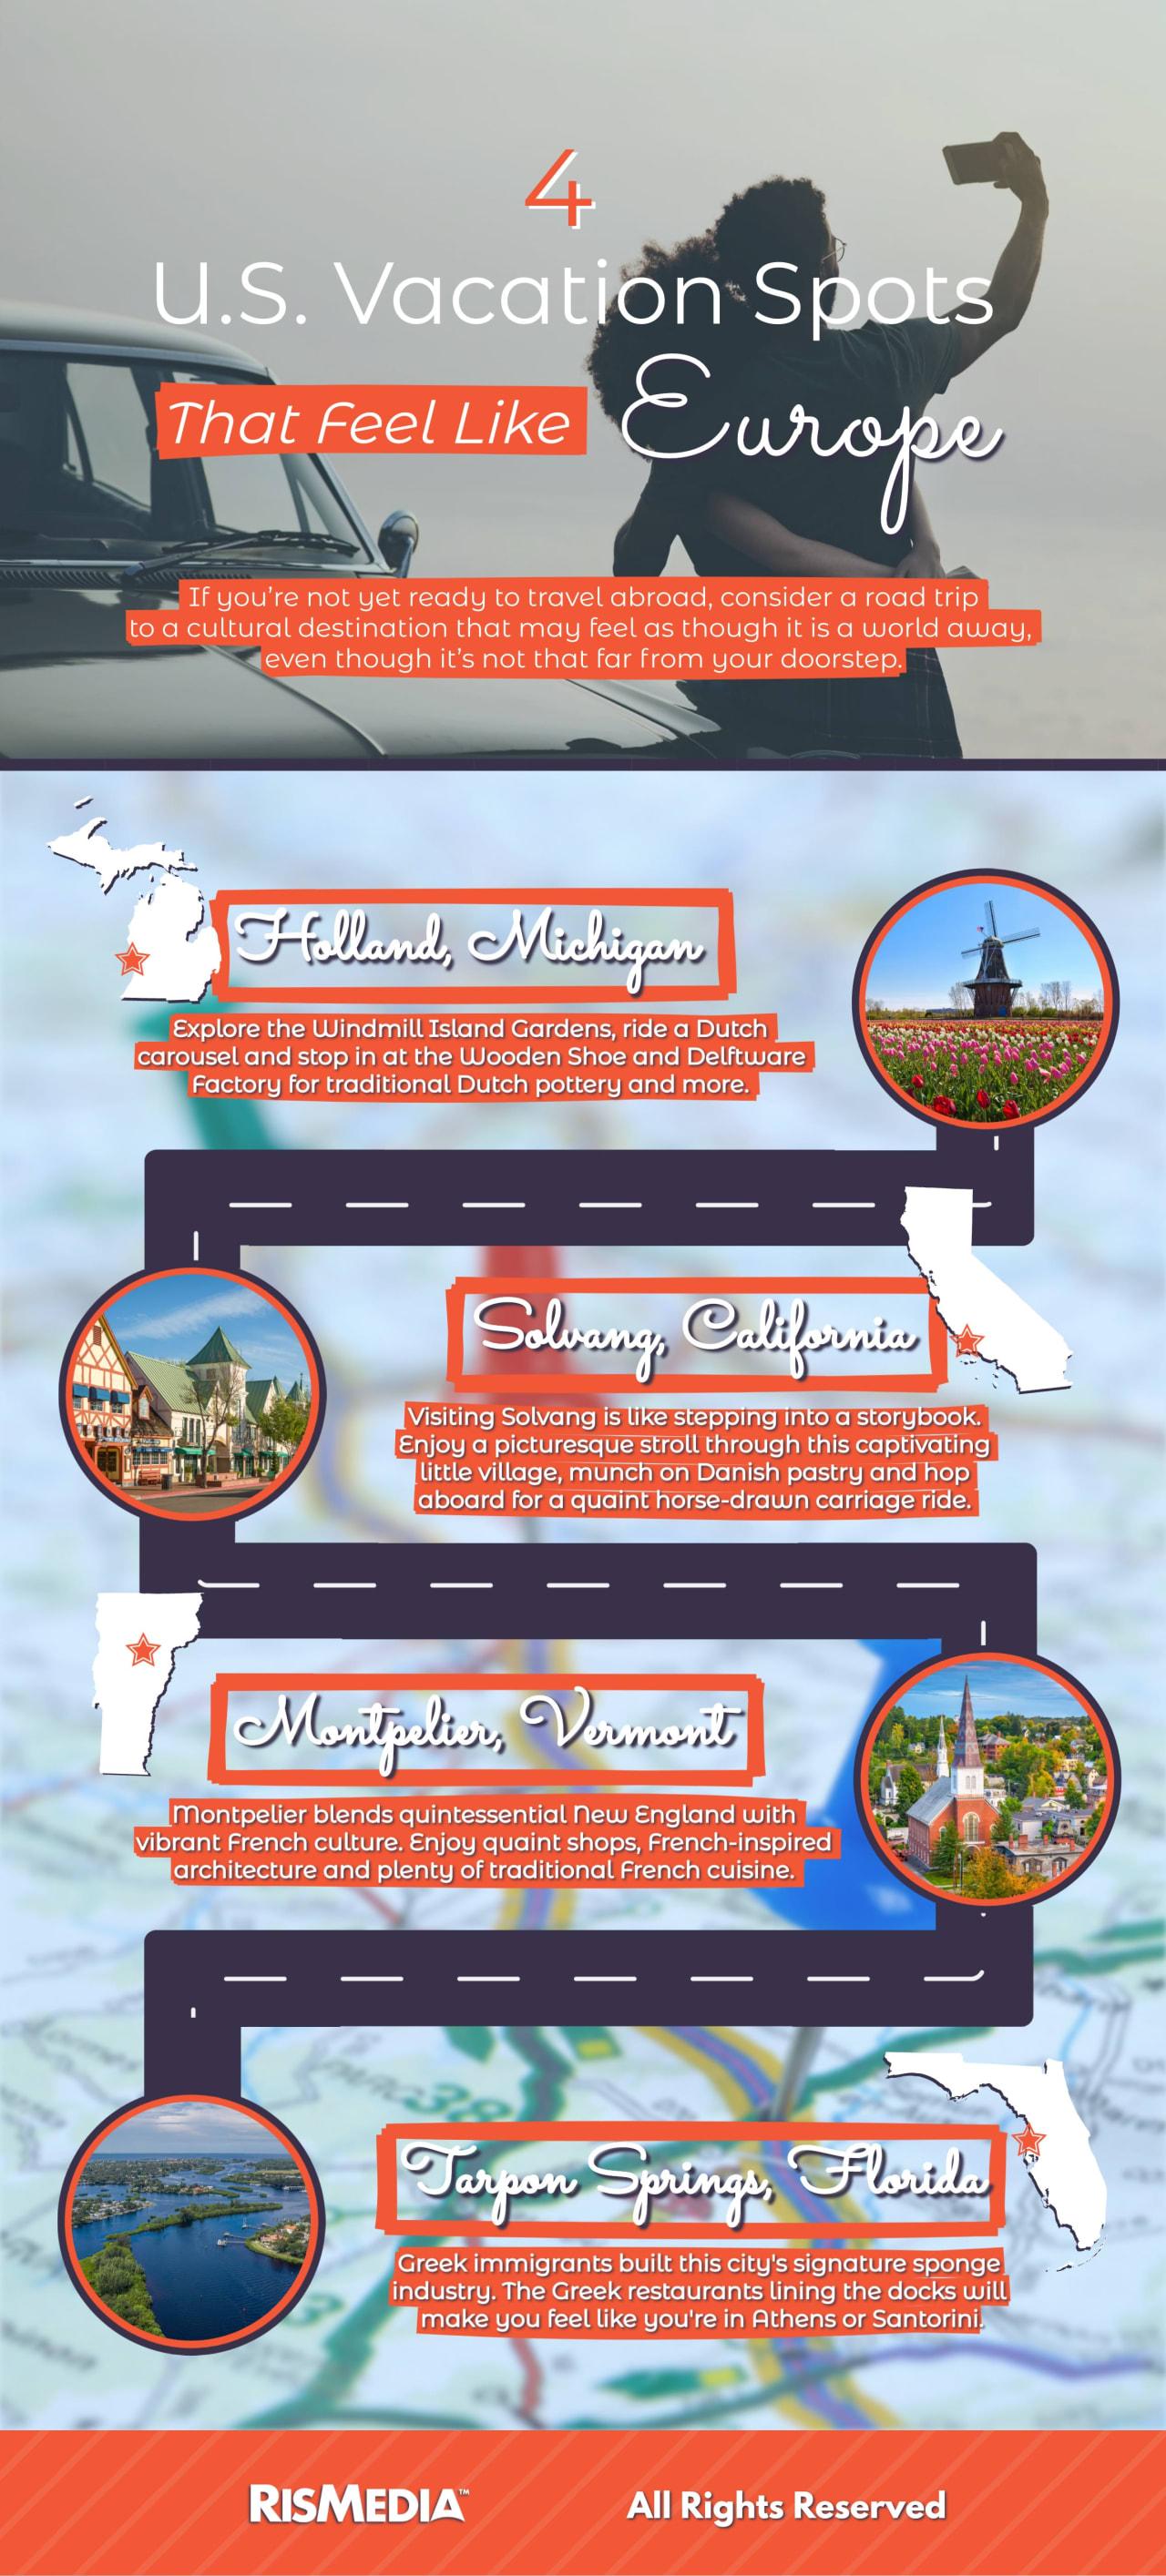 4 U.S. Vacation Spots That Feel Like Europe!